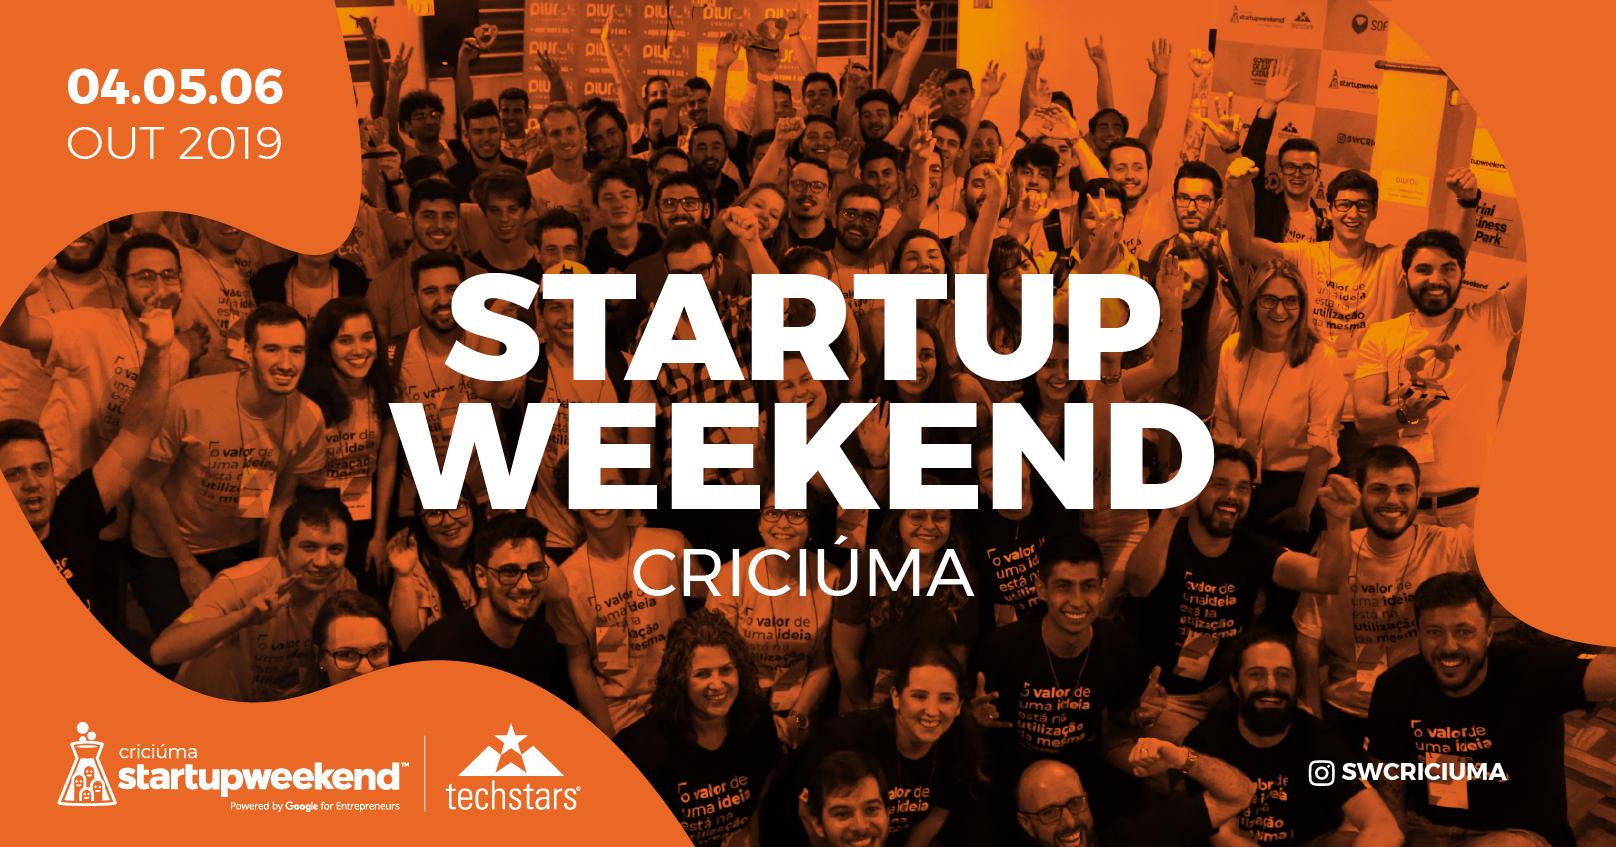 Resultado de imagem para Techstars Startup Weekend Criciúma 2019